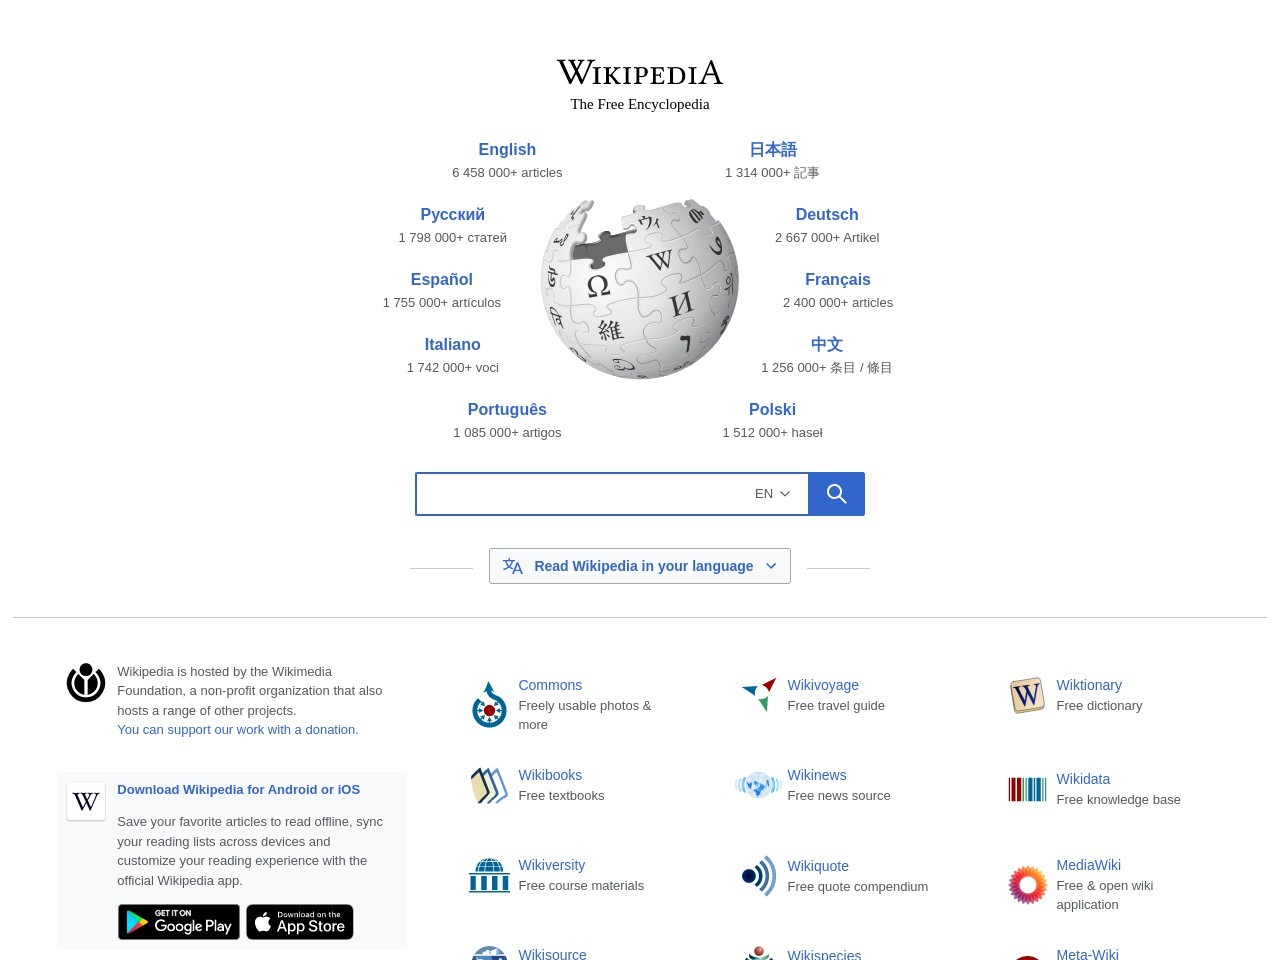 Webthumbnail wikipedia.org